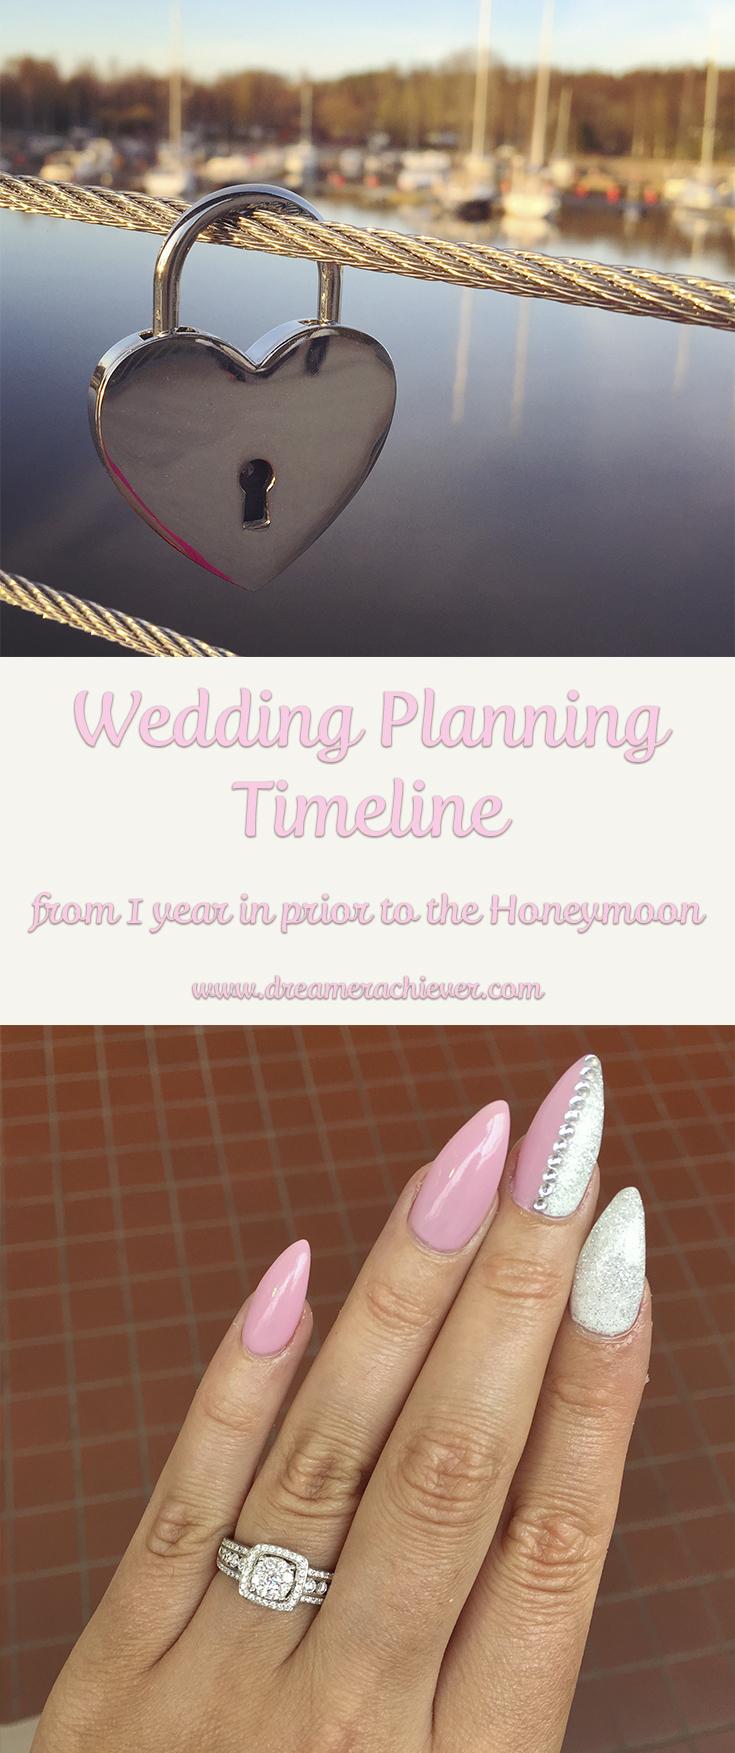 WeddingPlanningTimeline